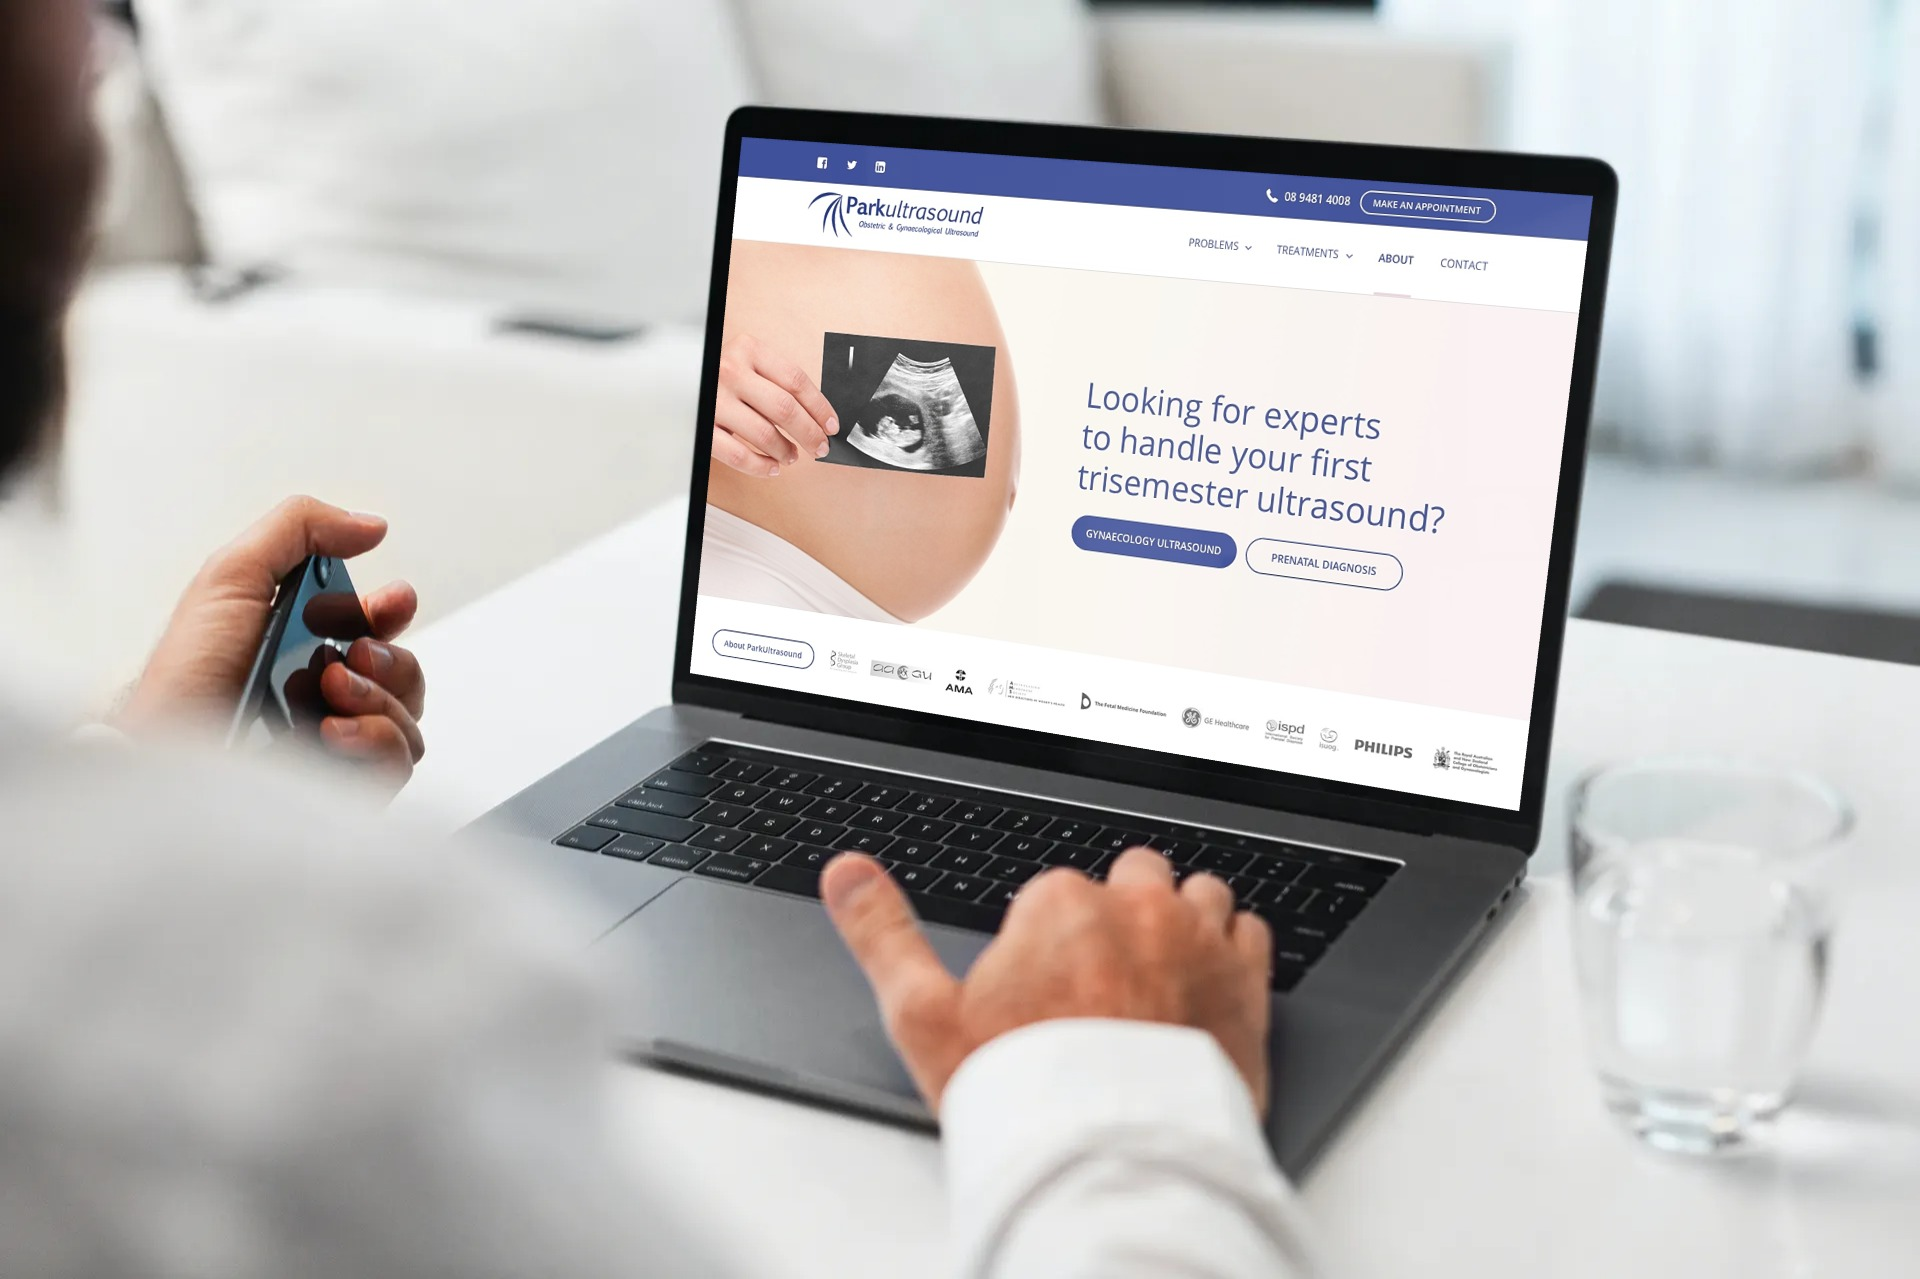 Ultrasound company website design template in Sydney